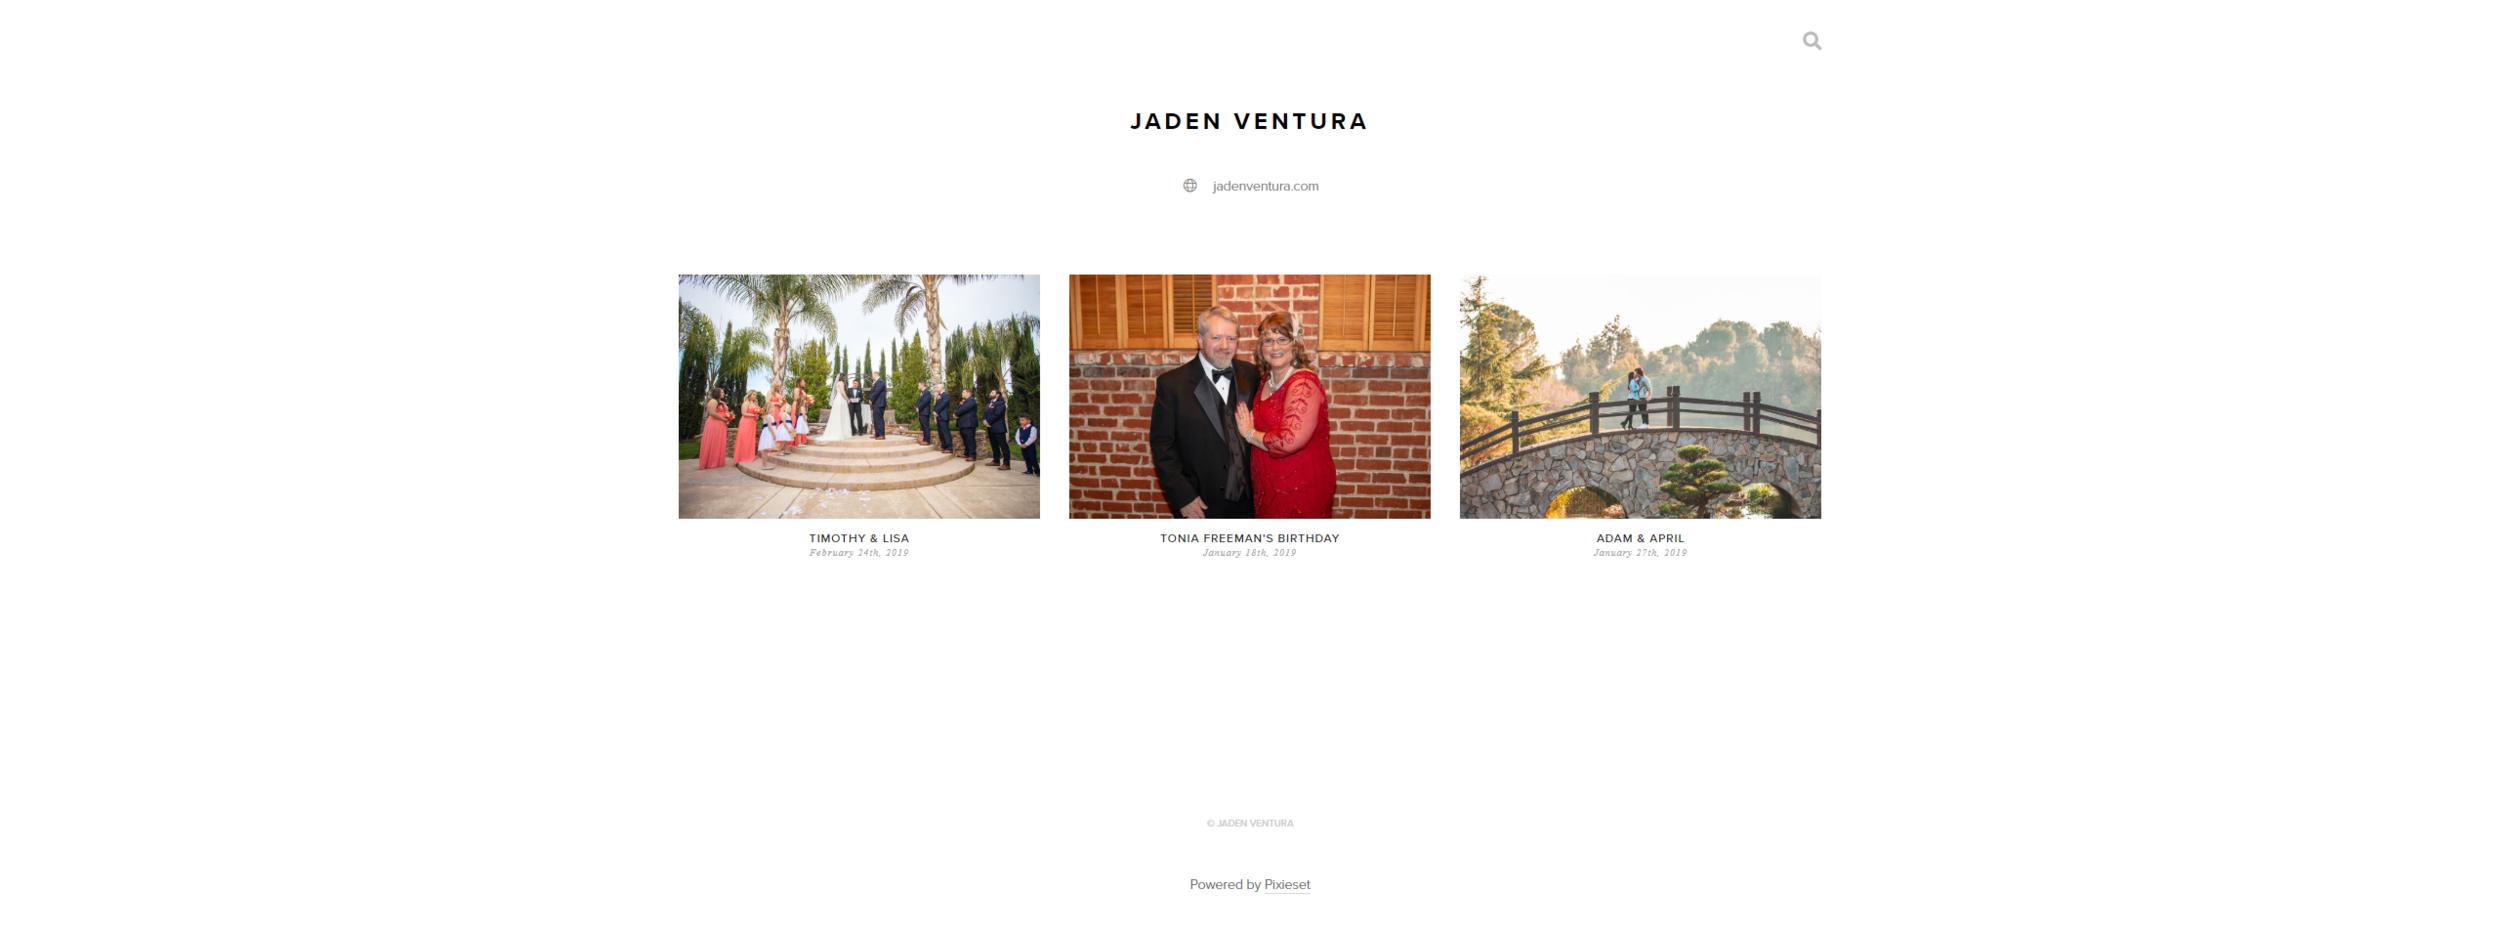 screencapture-jadenventura-pixieset-g-2019-03-19-14_18_37.png